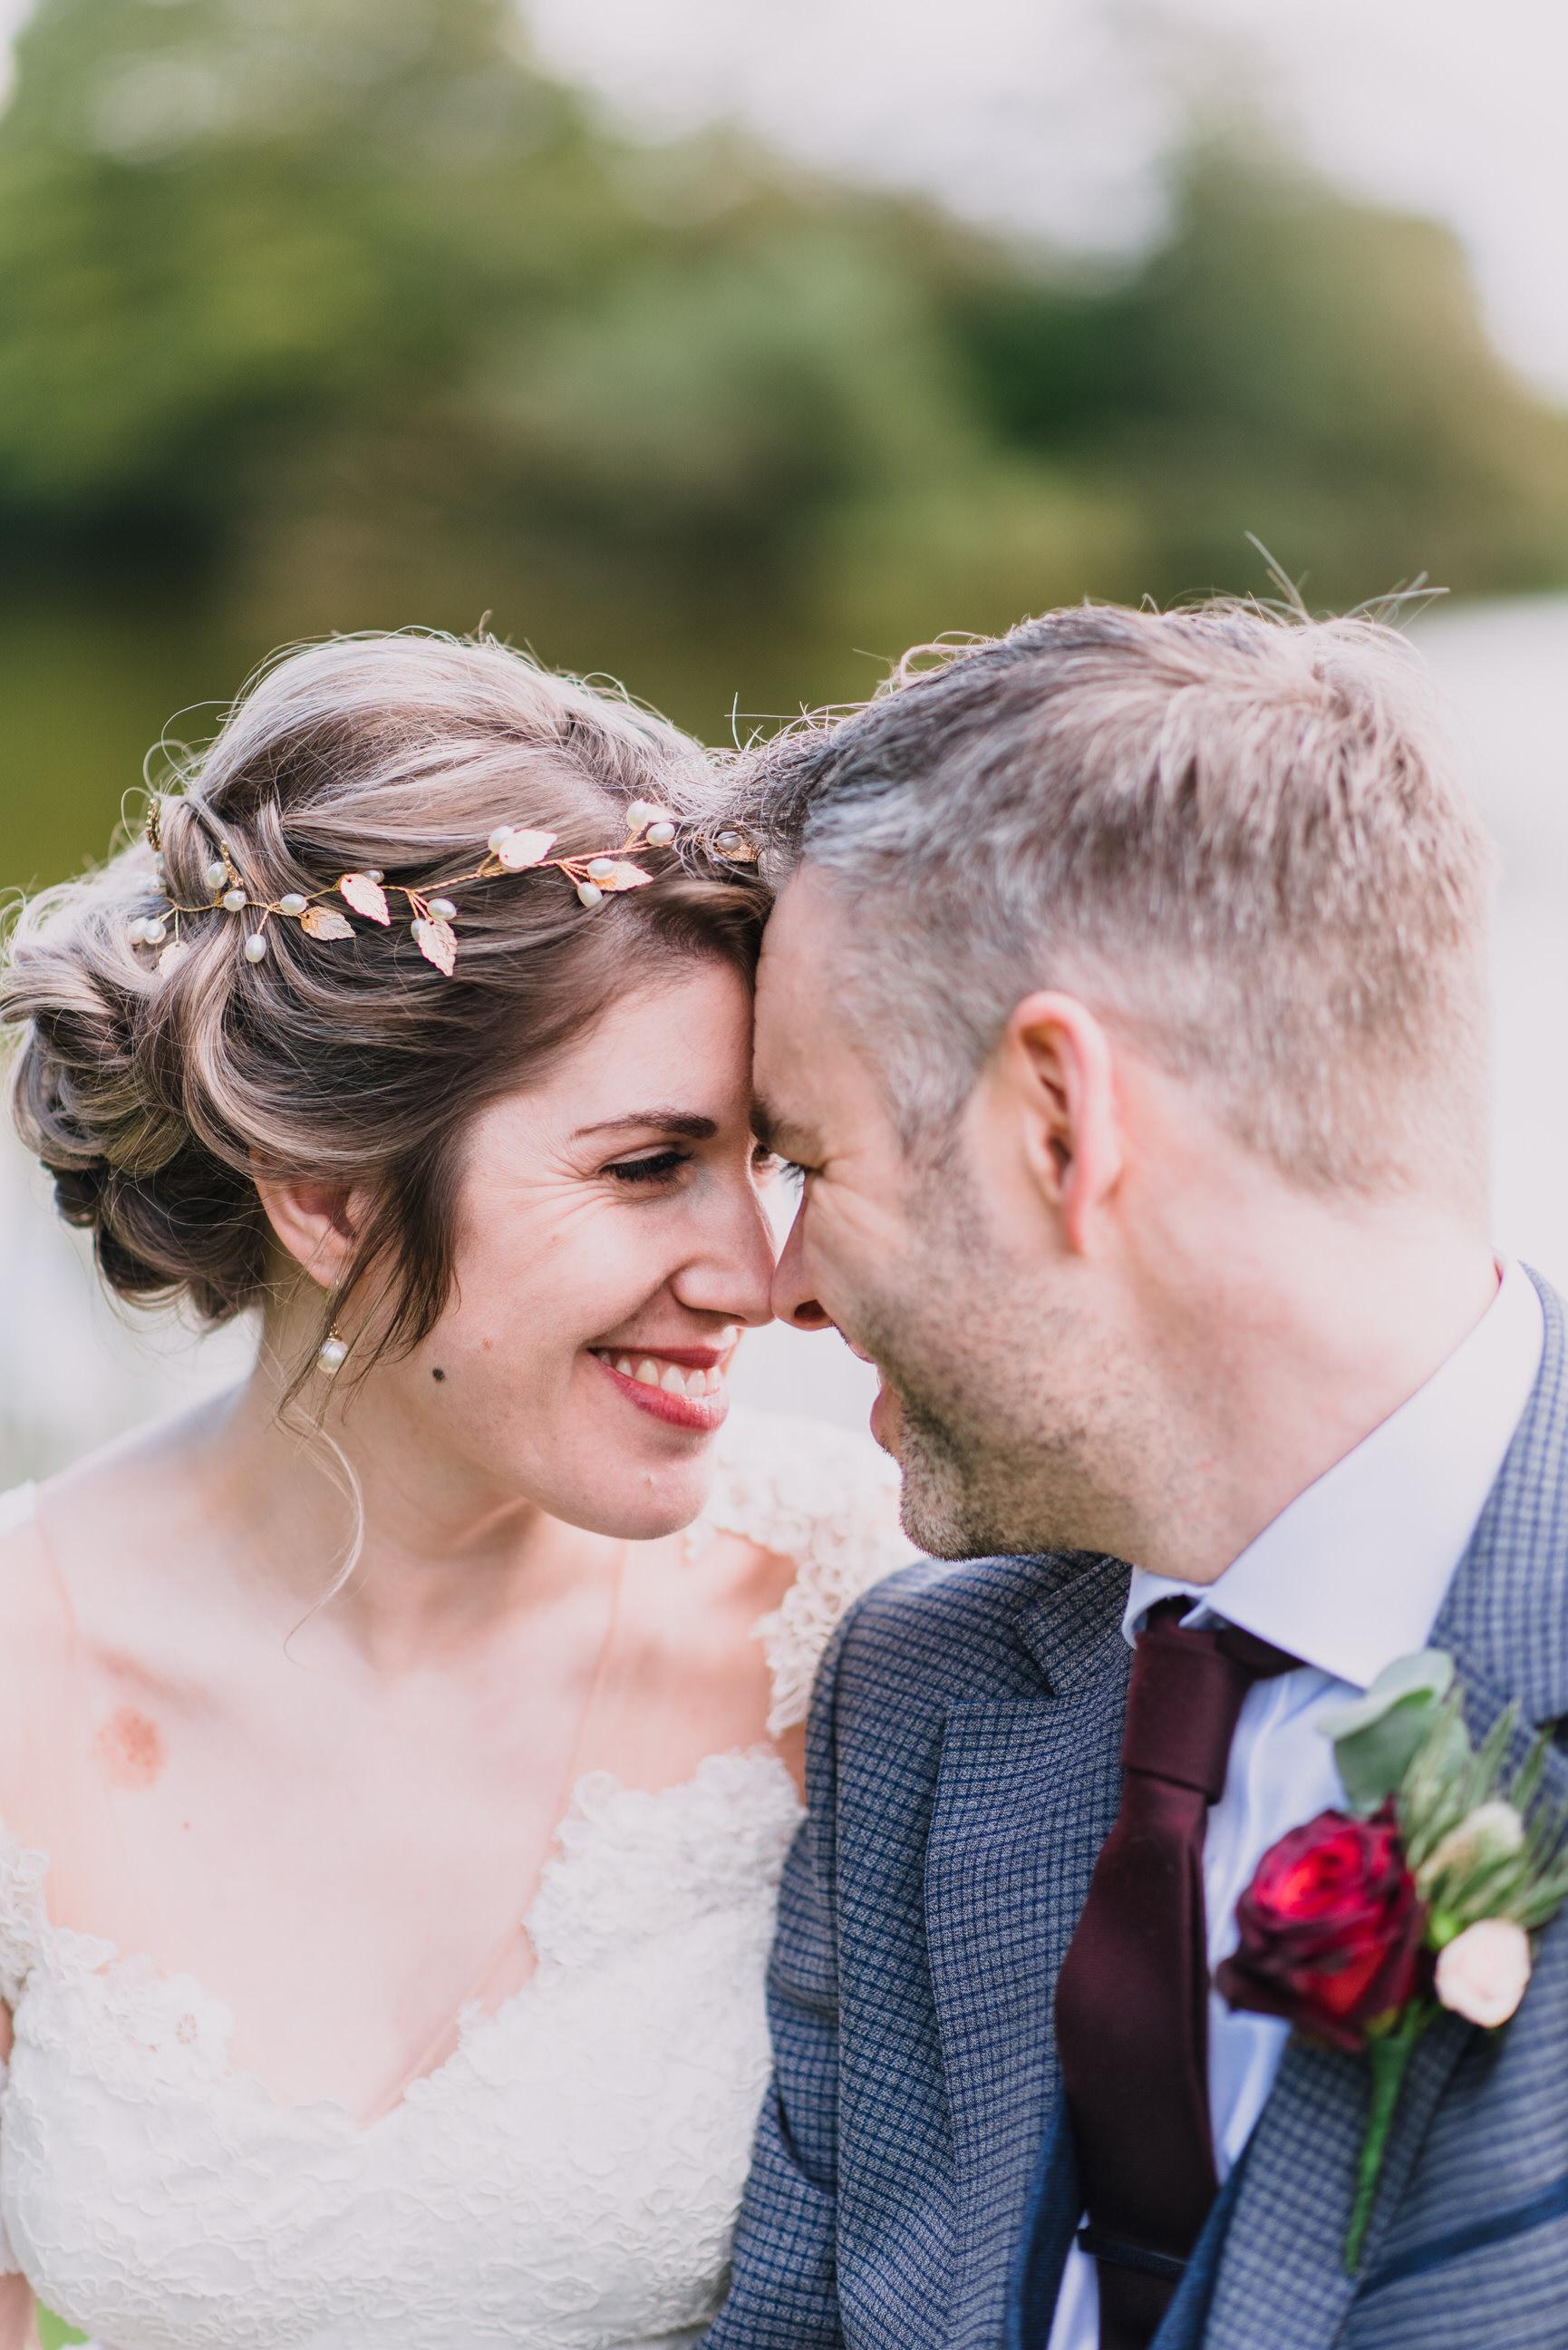 lissanoure castle wedding, northern ireland wedding photographer, romantic northern irish wedding venue, castle wedding ireland, natural wedding photography ni (86).jpg